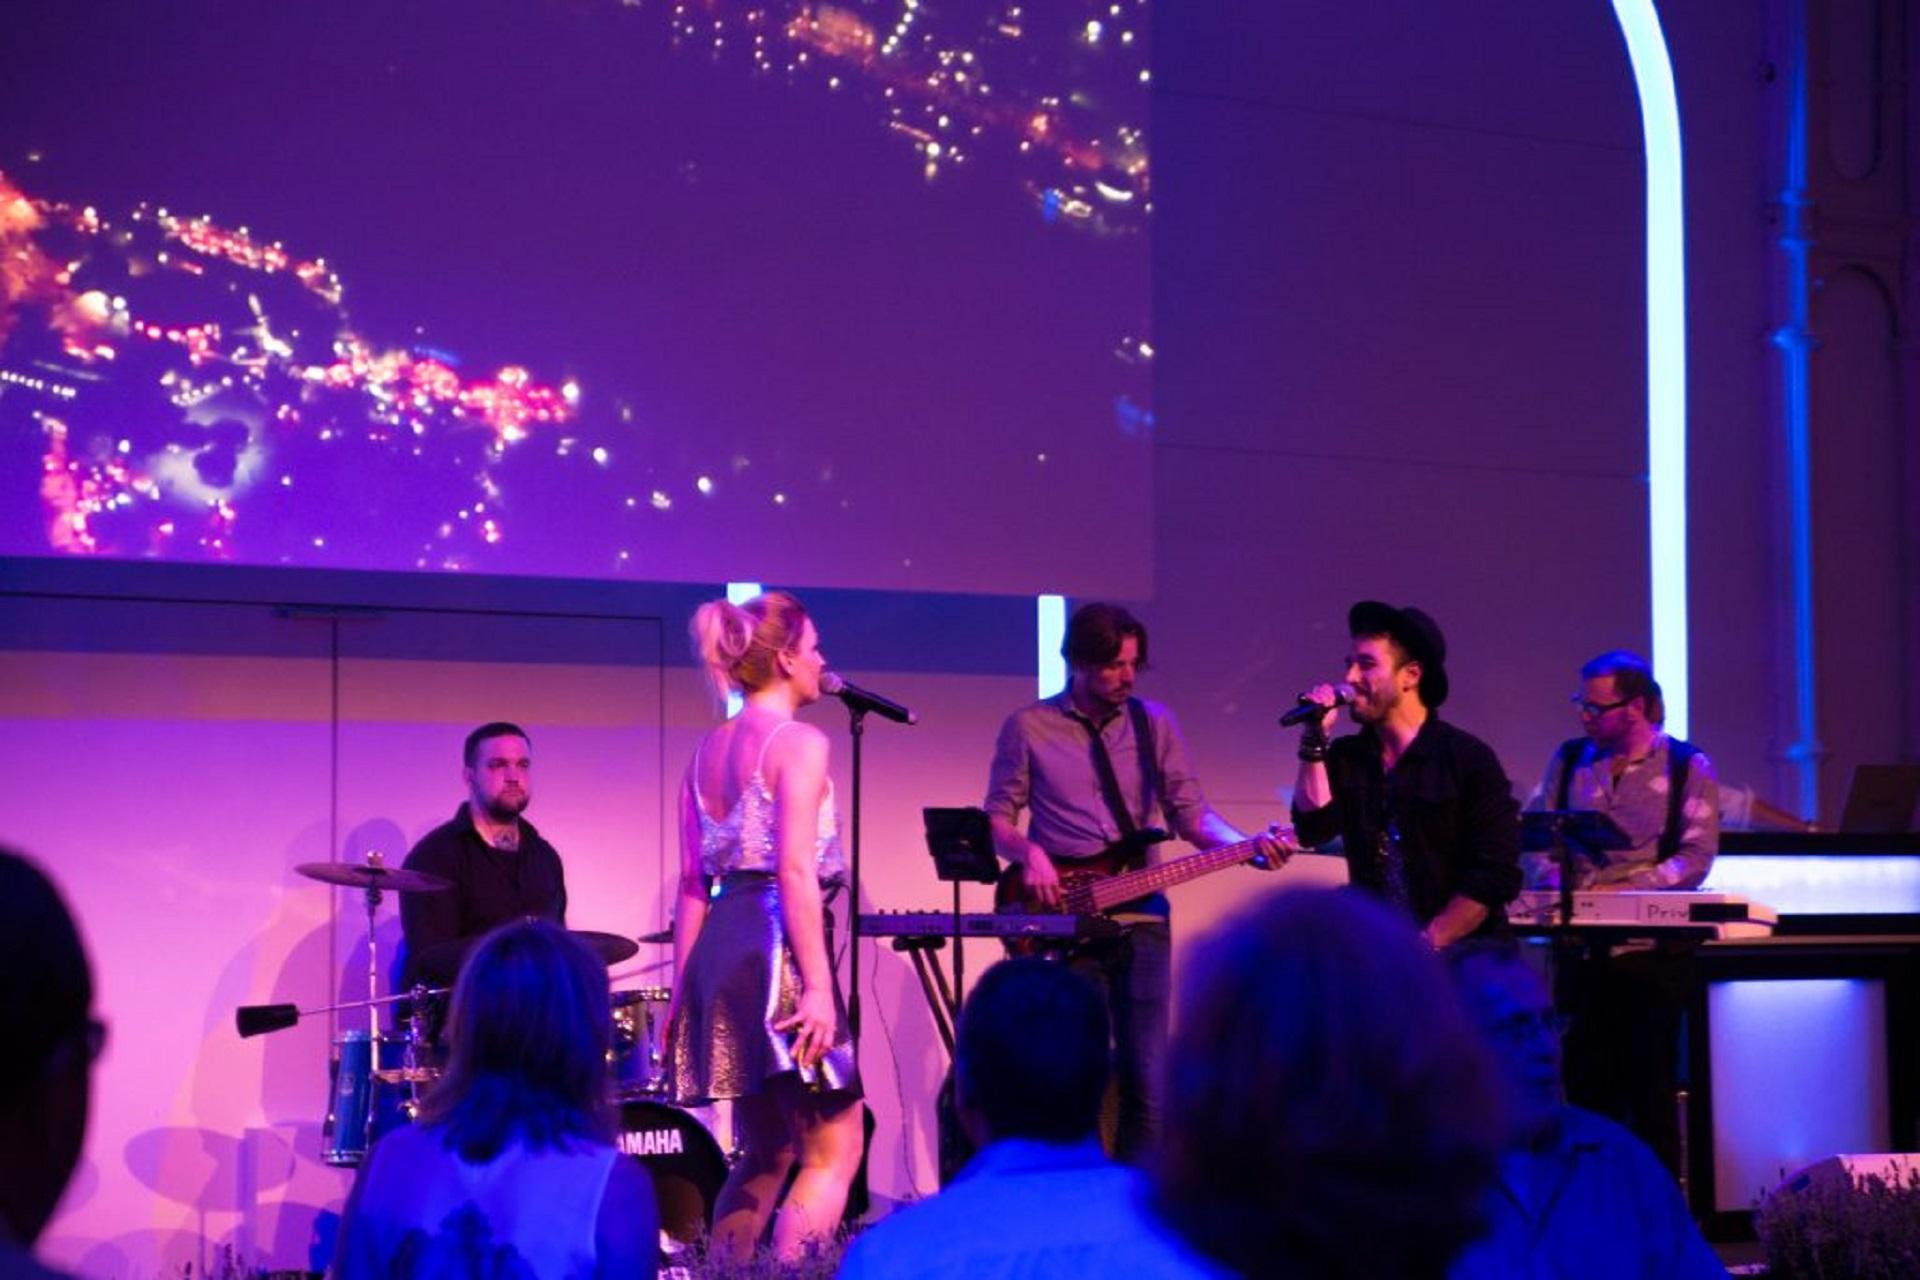 IMG_1883-1024x683-1 Live-Band für Event, Messe, Gala, Show